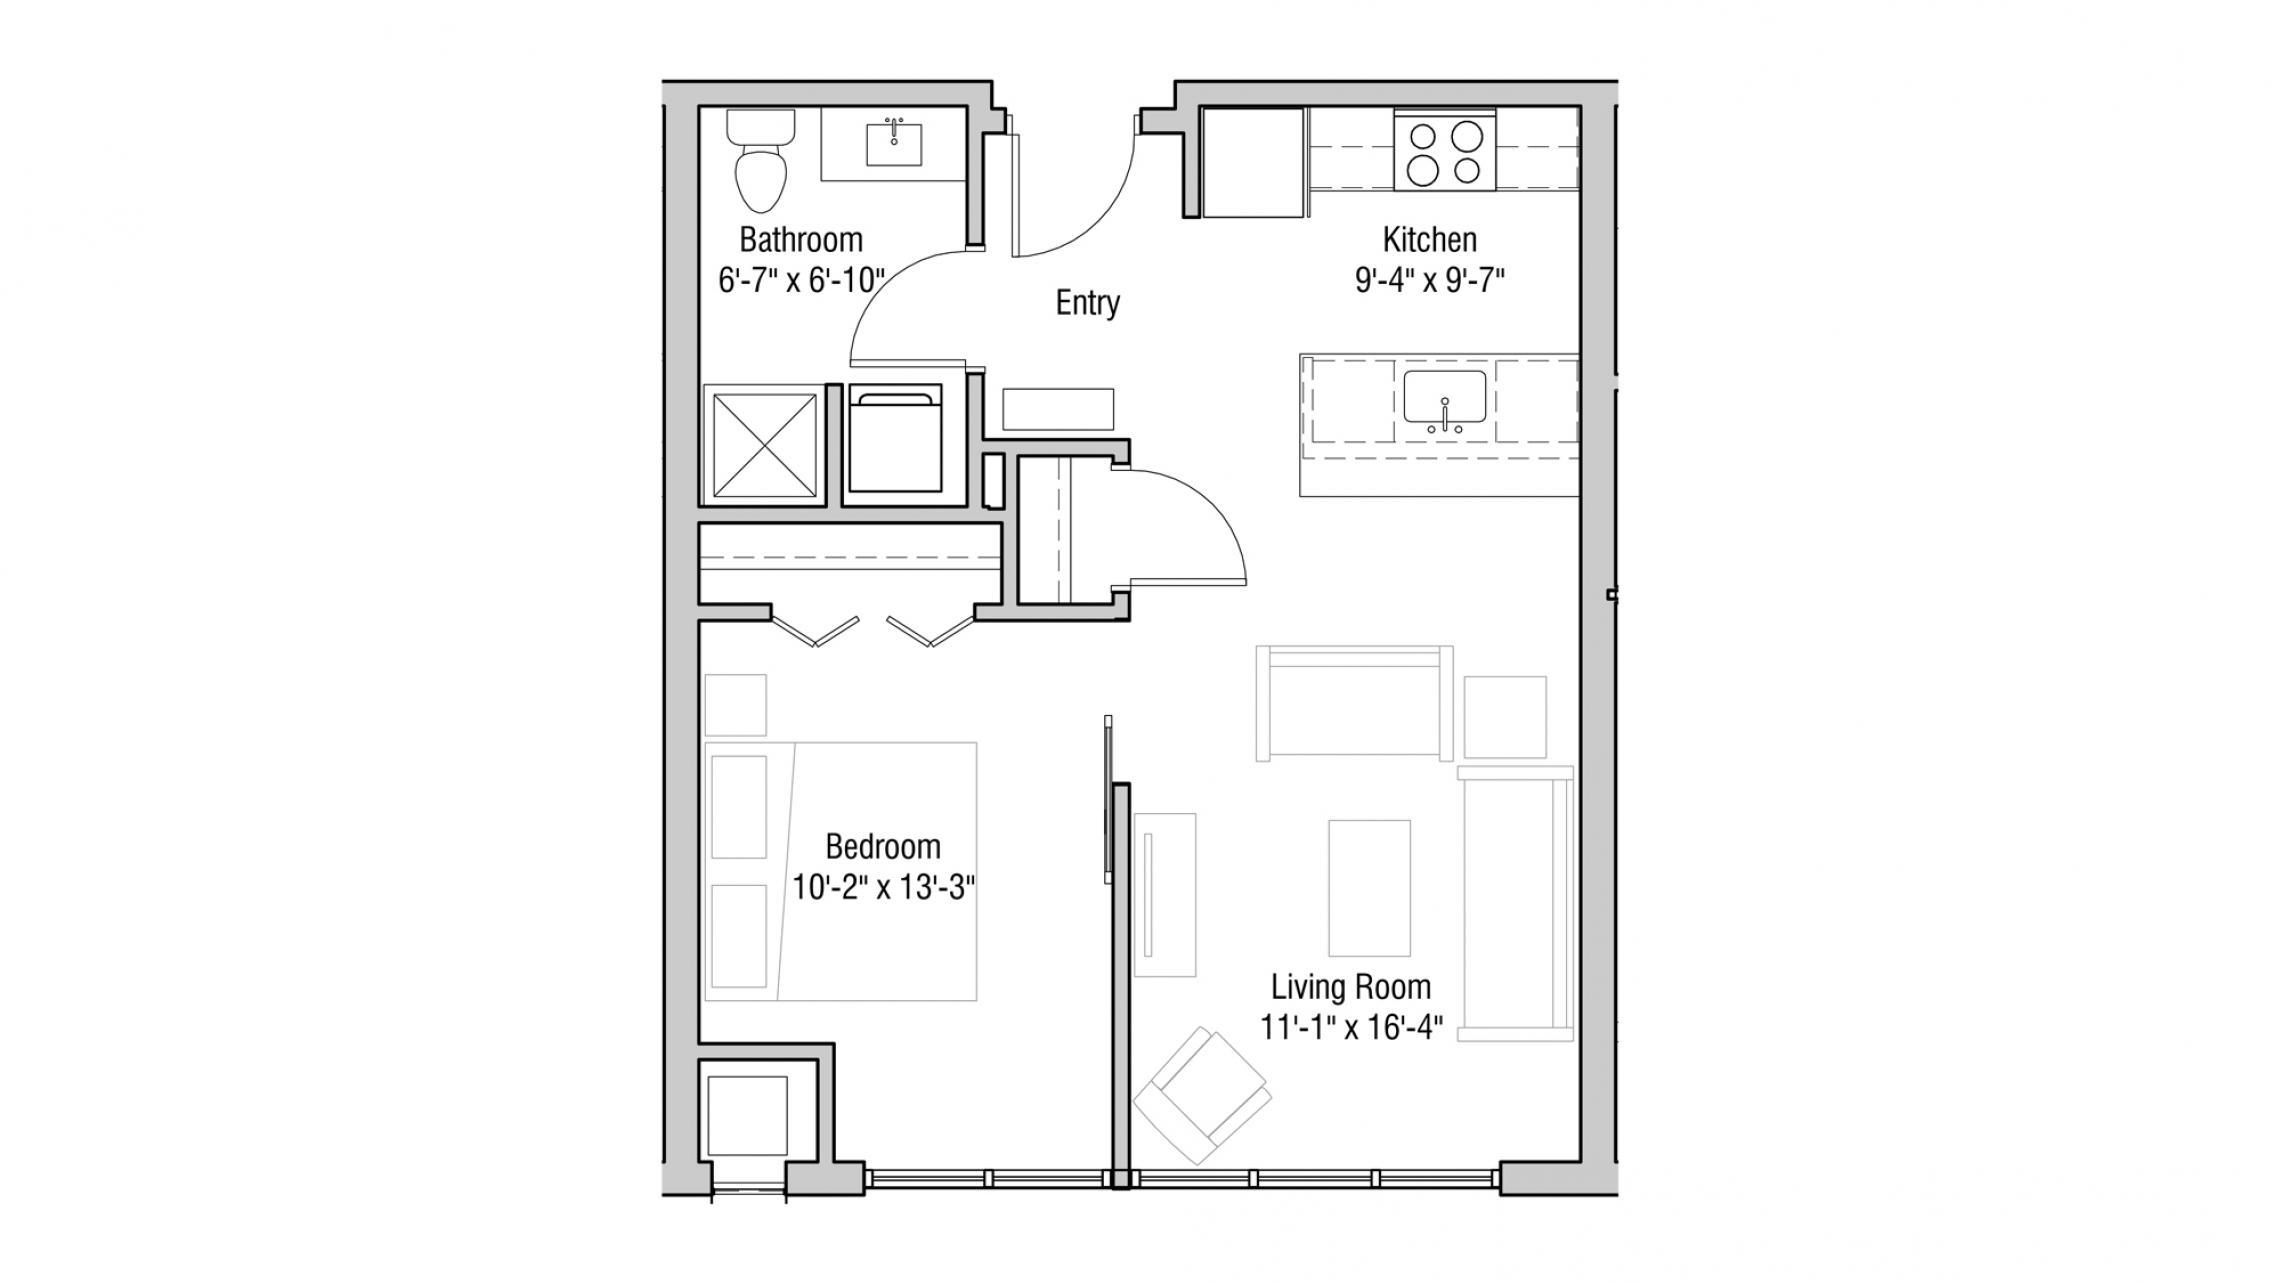 ULI Quarter Row 222 - One Bedroom, One Bathroom